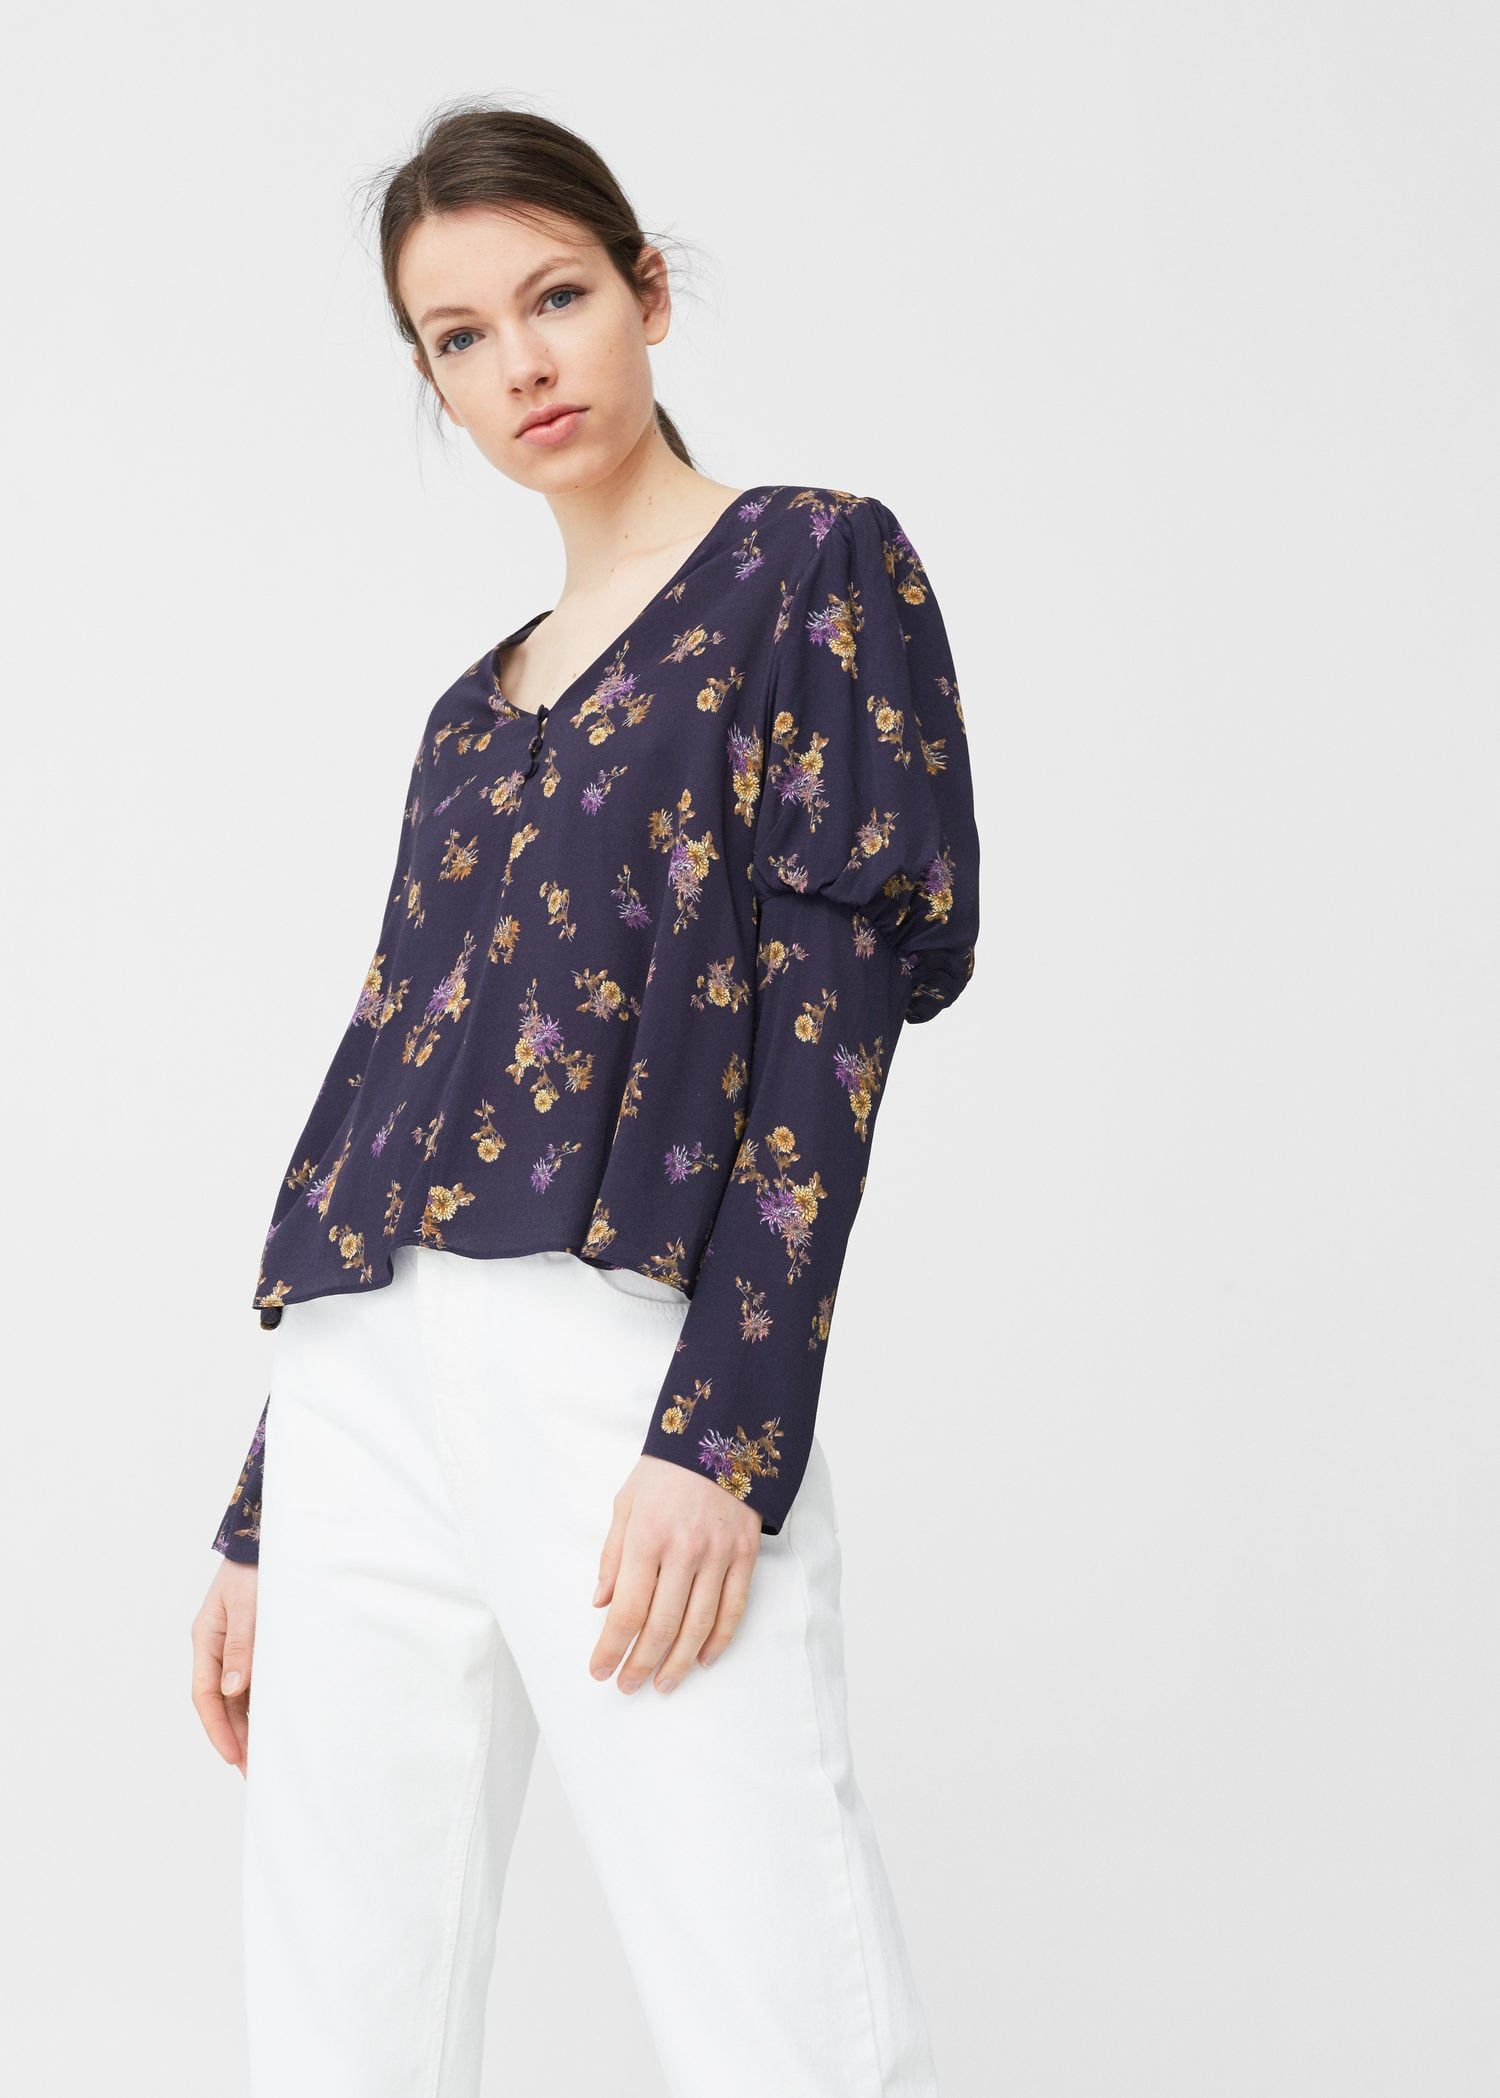 · Estampado Blusa Work Mujer My Floral Pinterest qZPR6xp